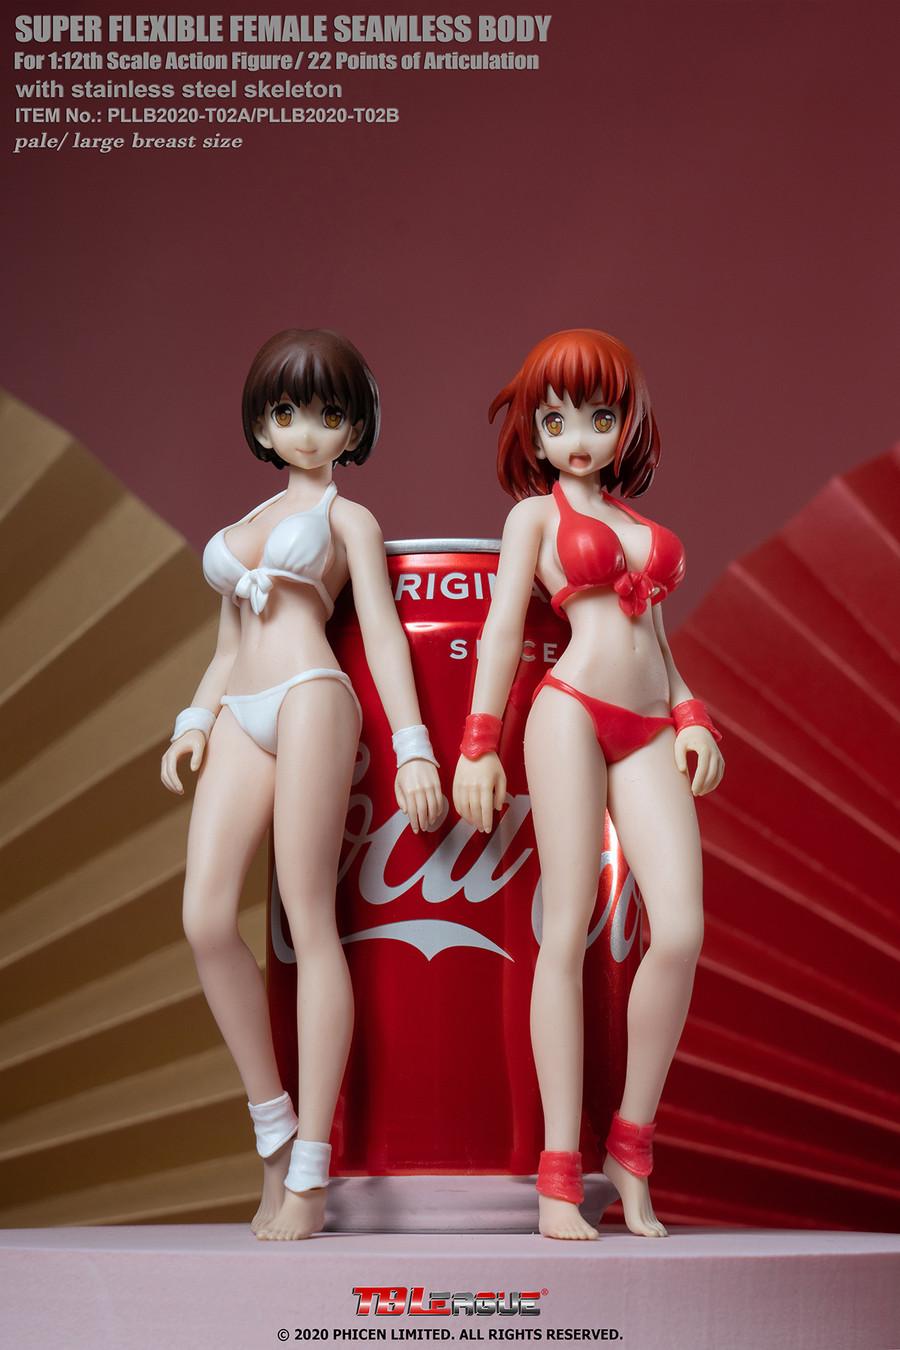 TBLeague - 1/12 Super-Flexible Female Seamless Pale Large Bust Body - Anime Red Bikini